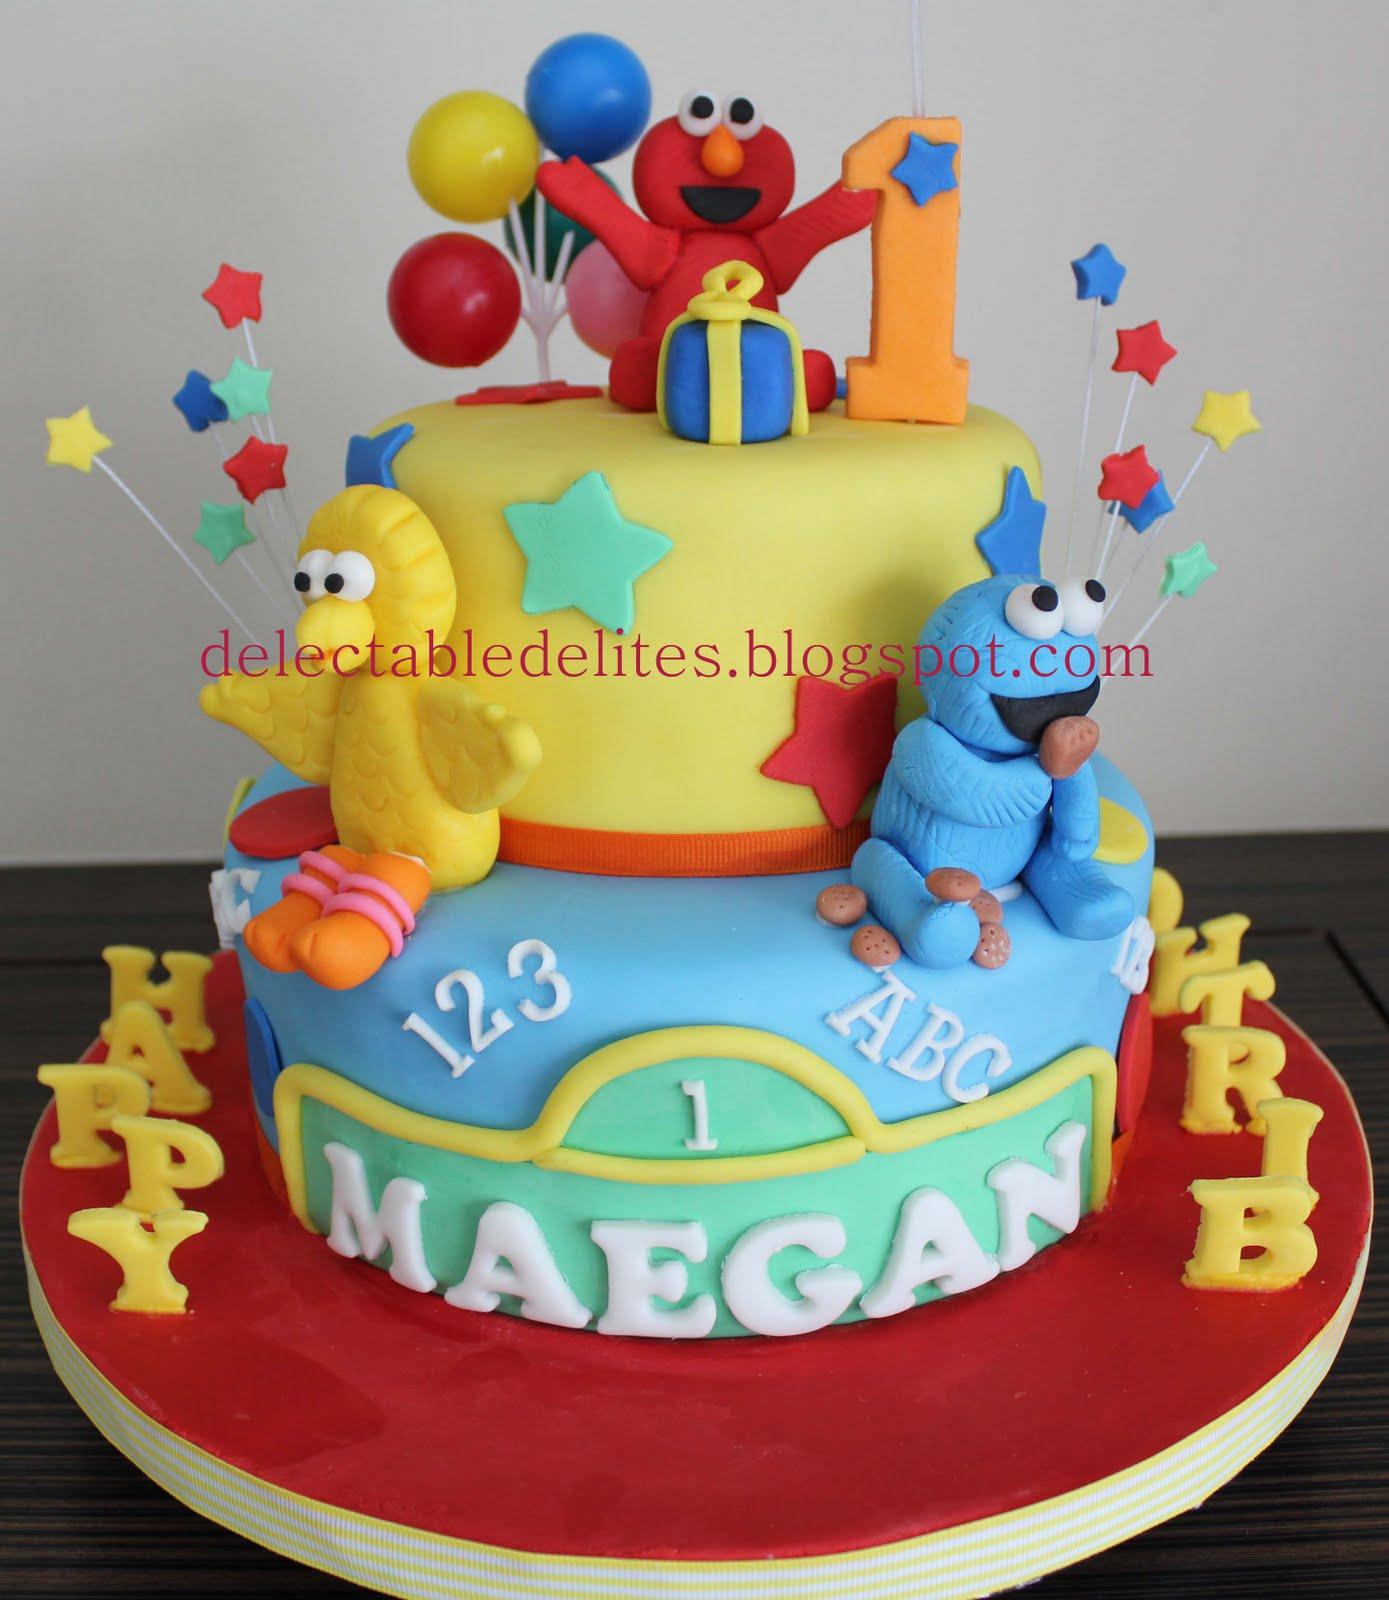 Delectable Delites Sesame Street theme cake for Maegan